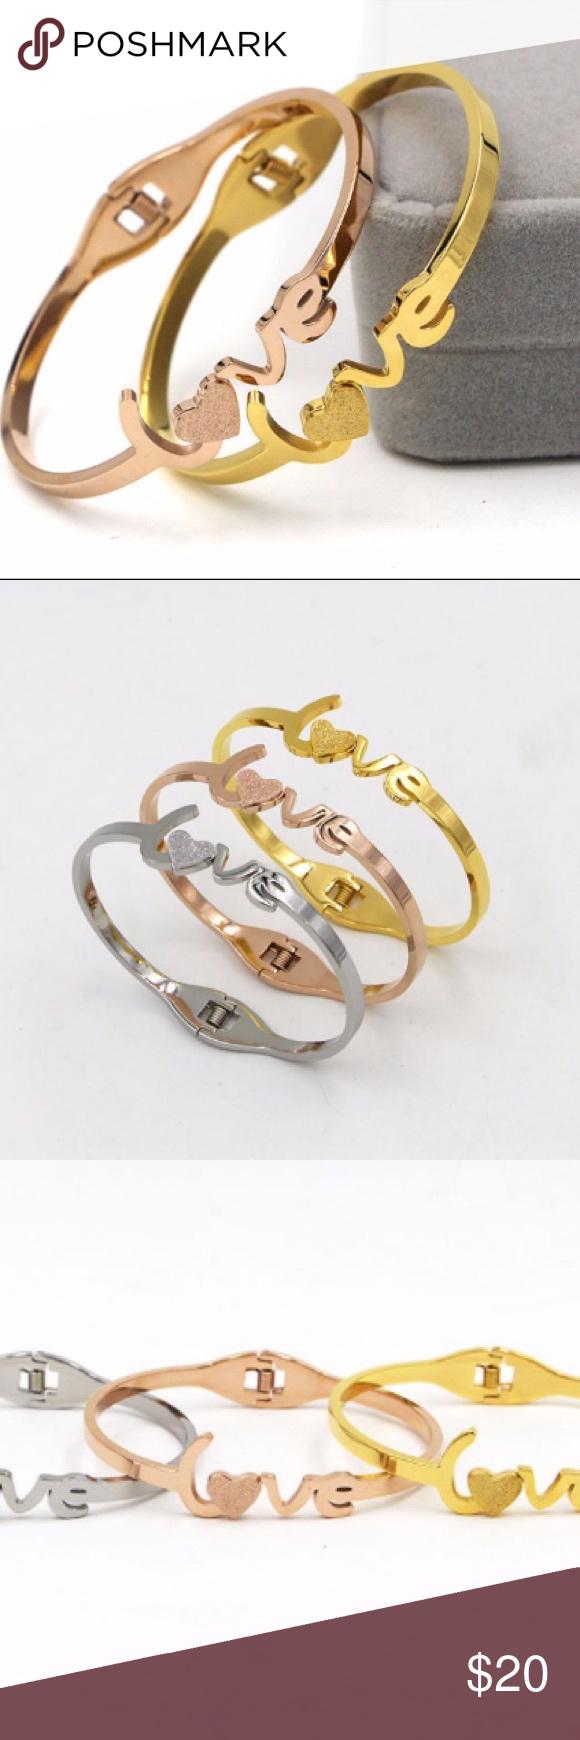 love Bracelet Rose Gold Plated Love Bracelet Material Titanium